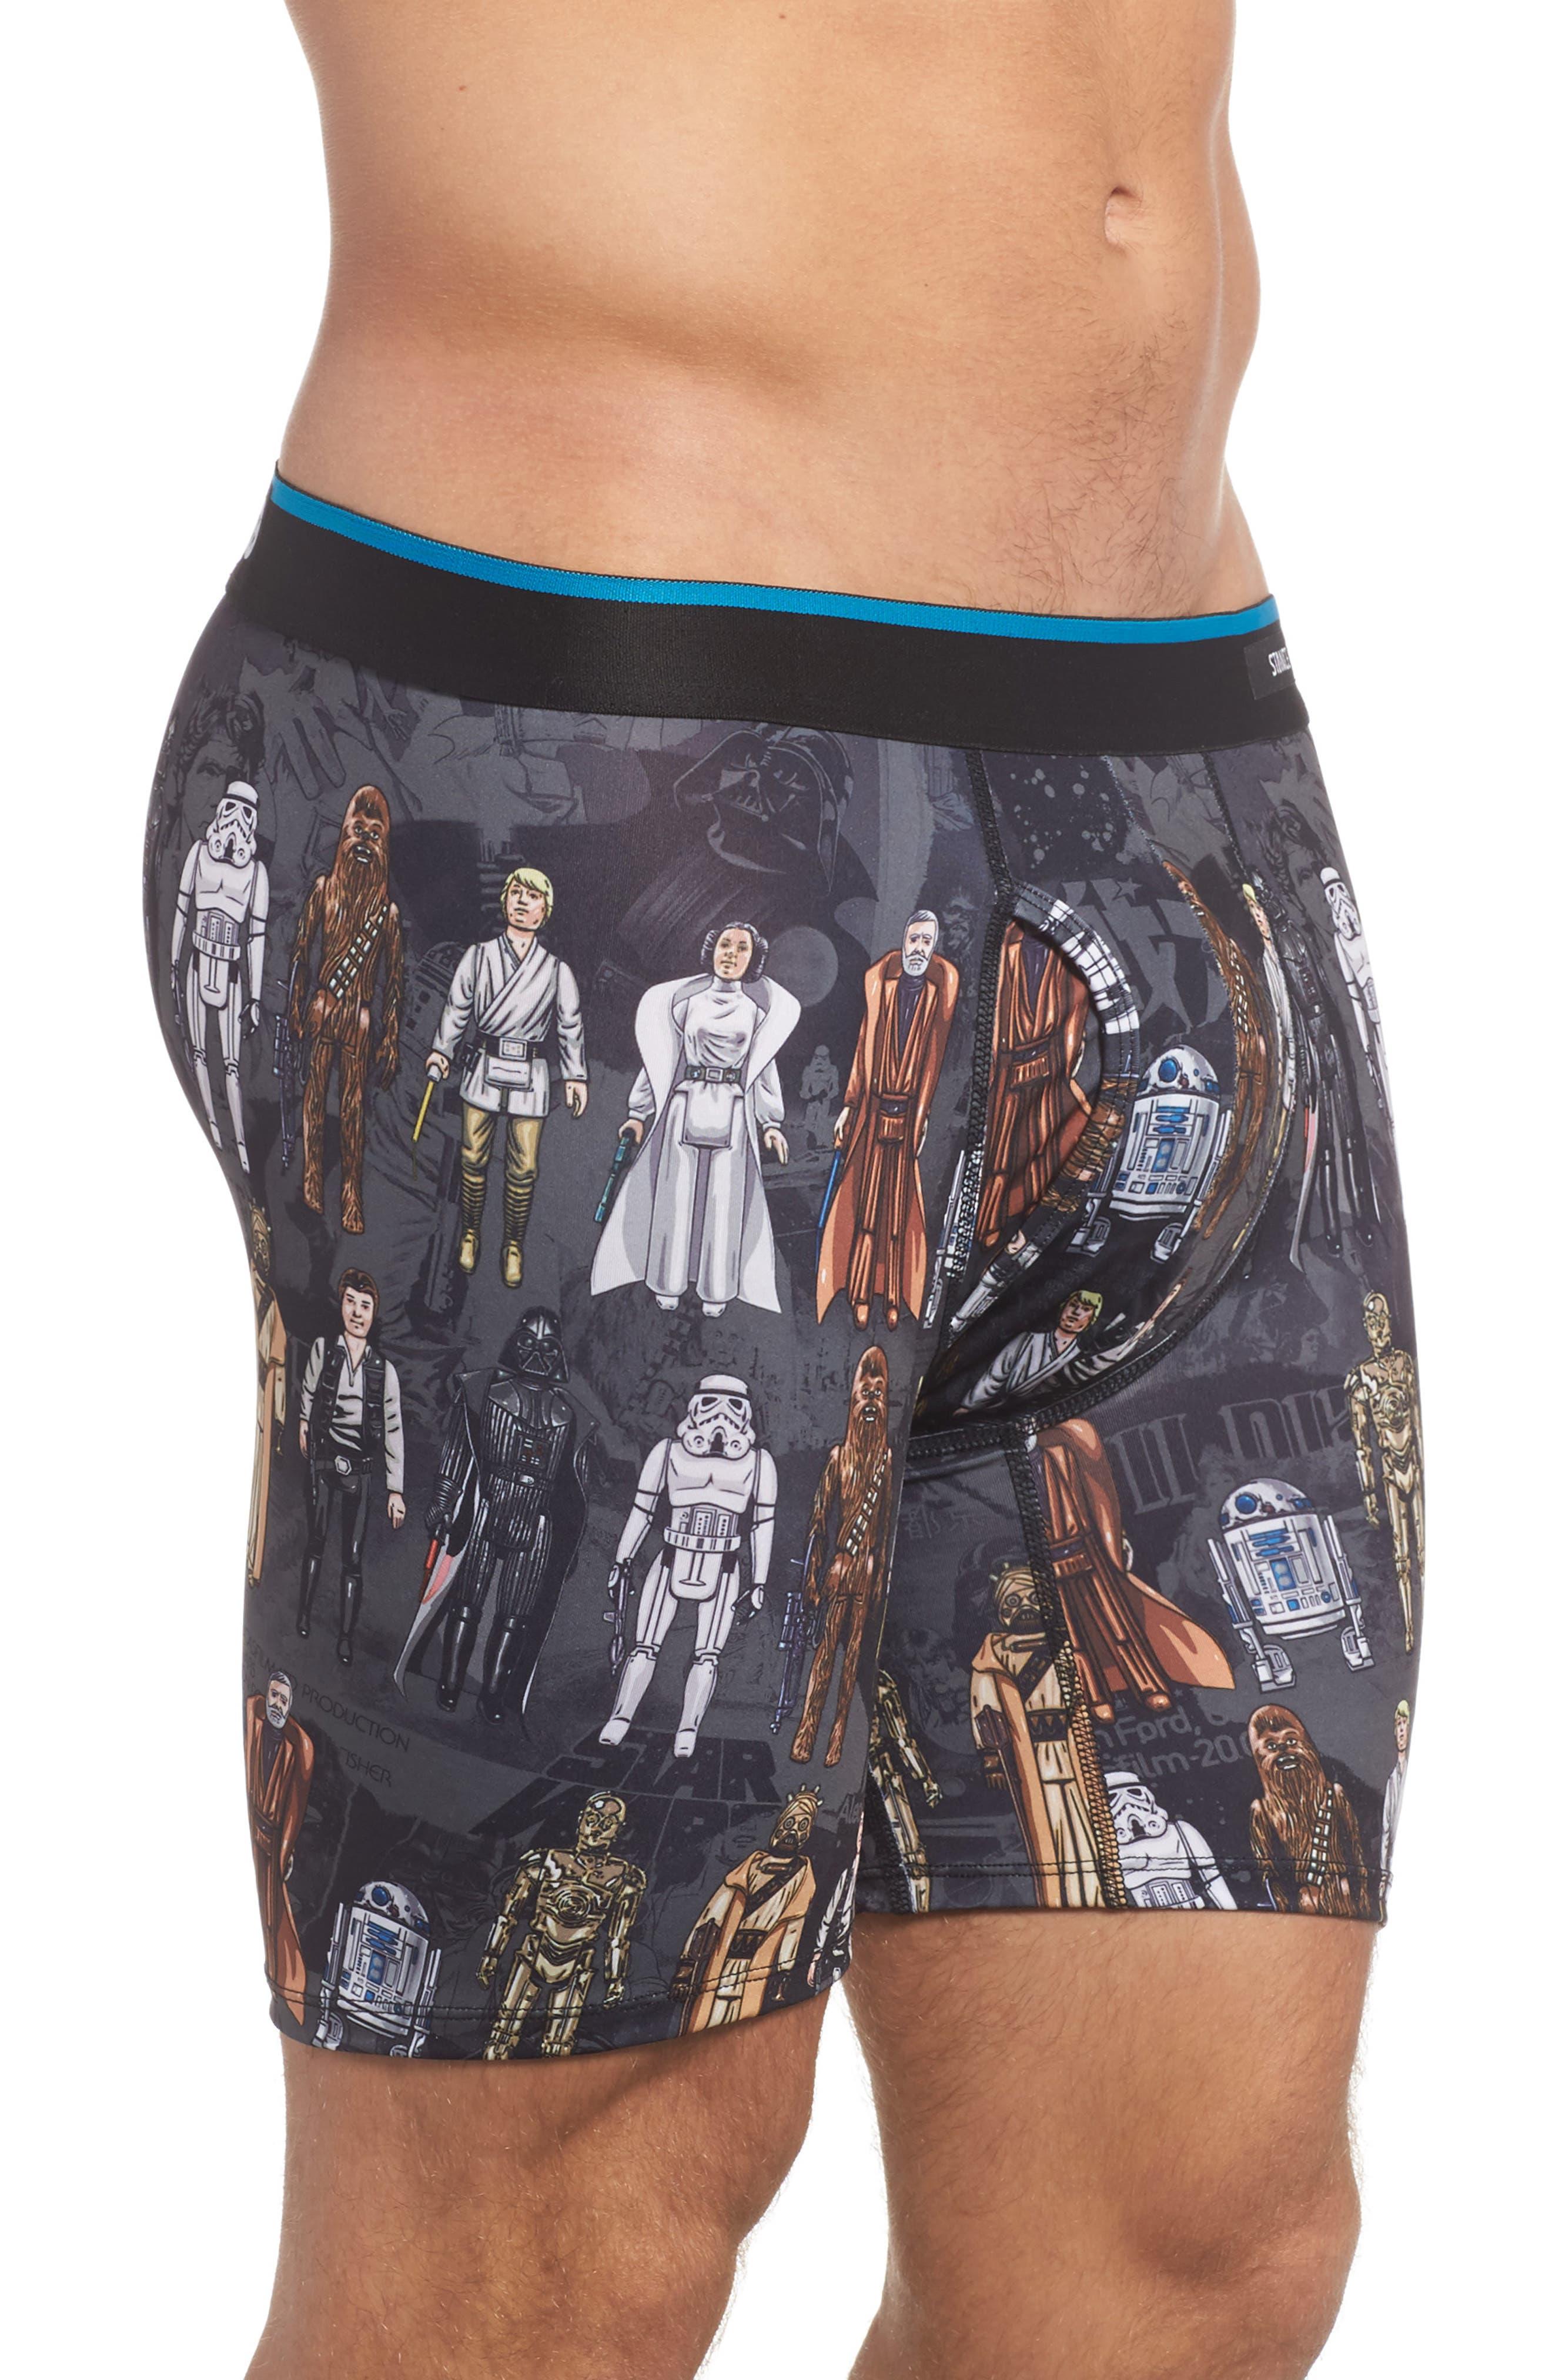 Star Wars<sup>™</sup> Boxer Briefs,                             Alternate thumbnail 3, color,                             Black